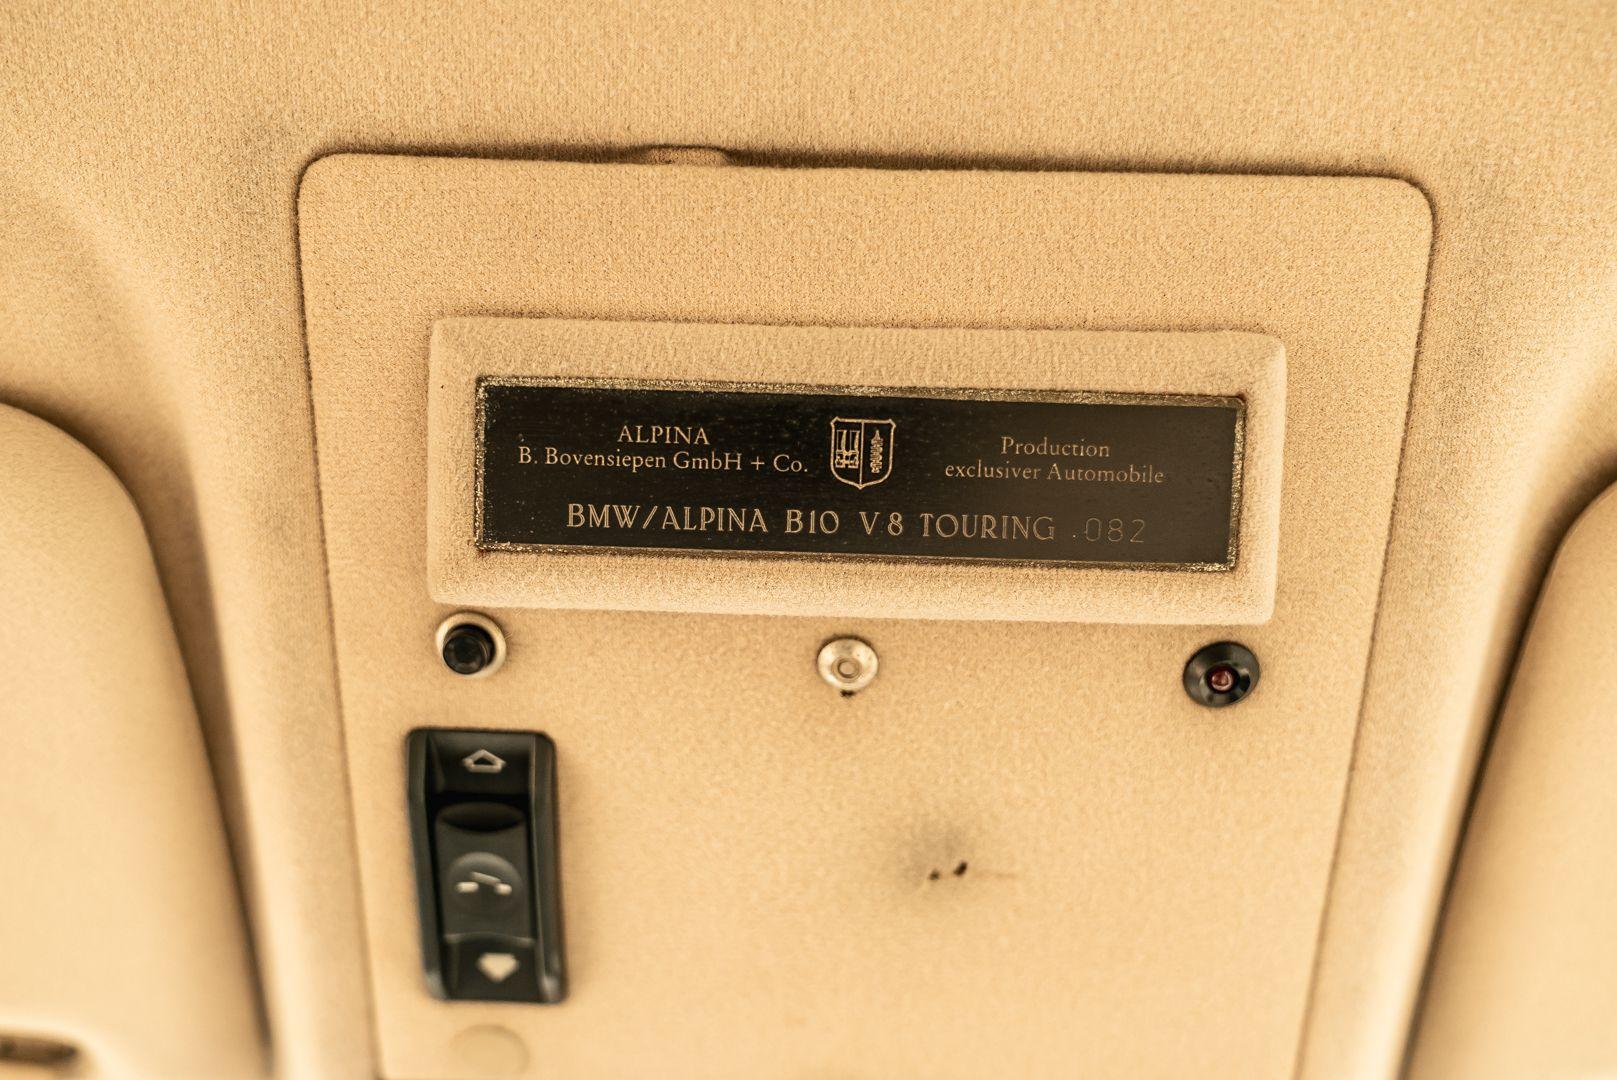 1998 BMW Alpina B10 Touring V8 82/204 78188